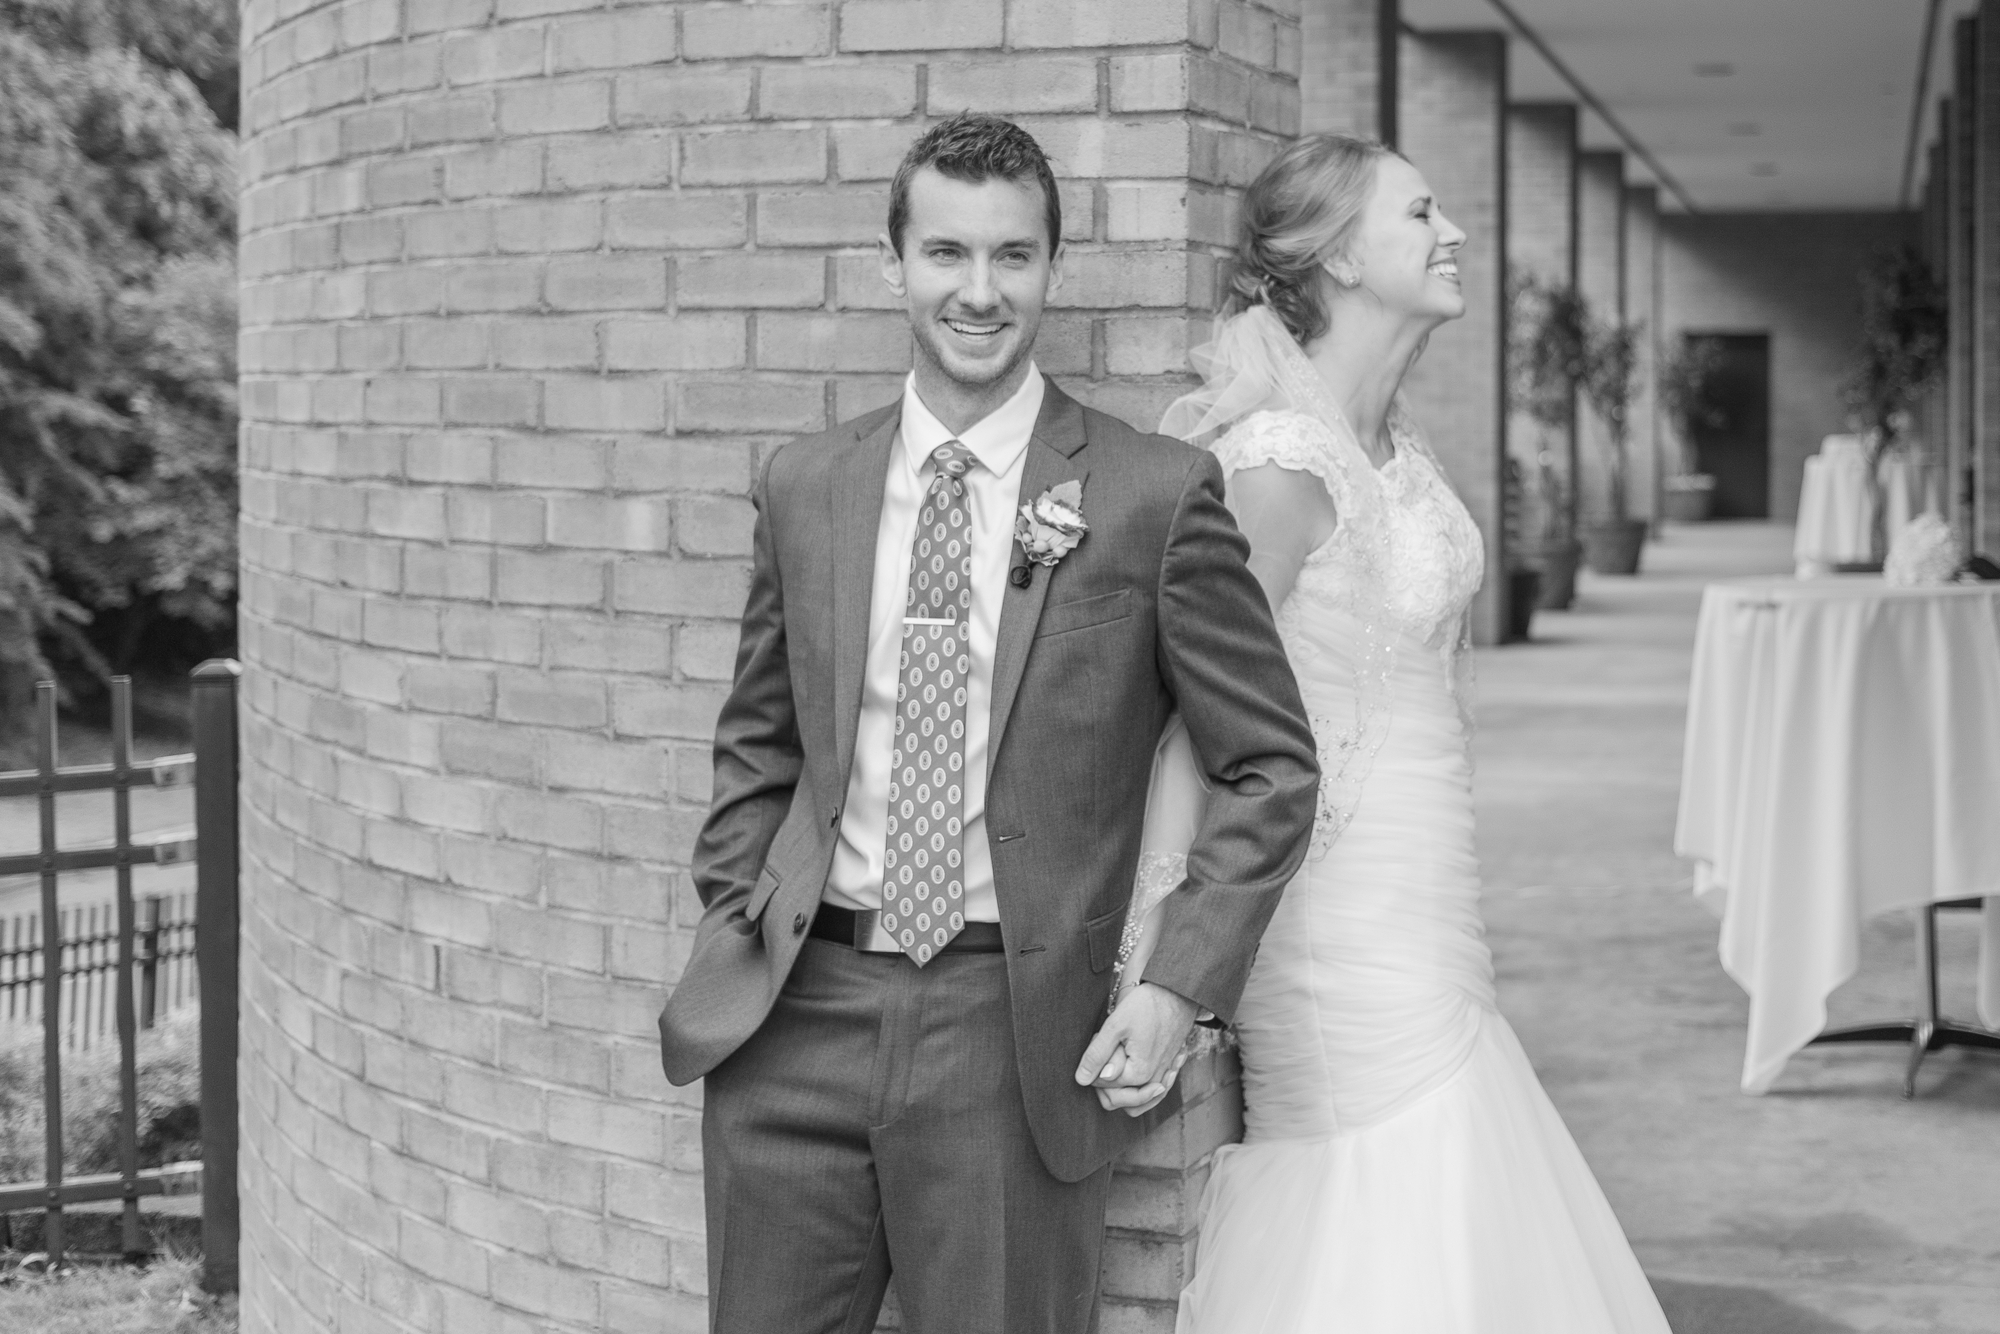 gaywedding-295.jpg